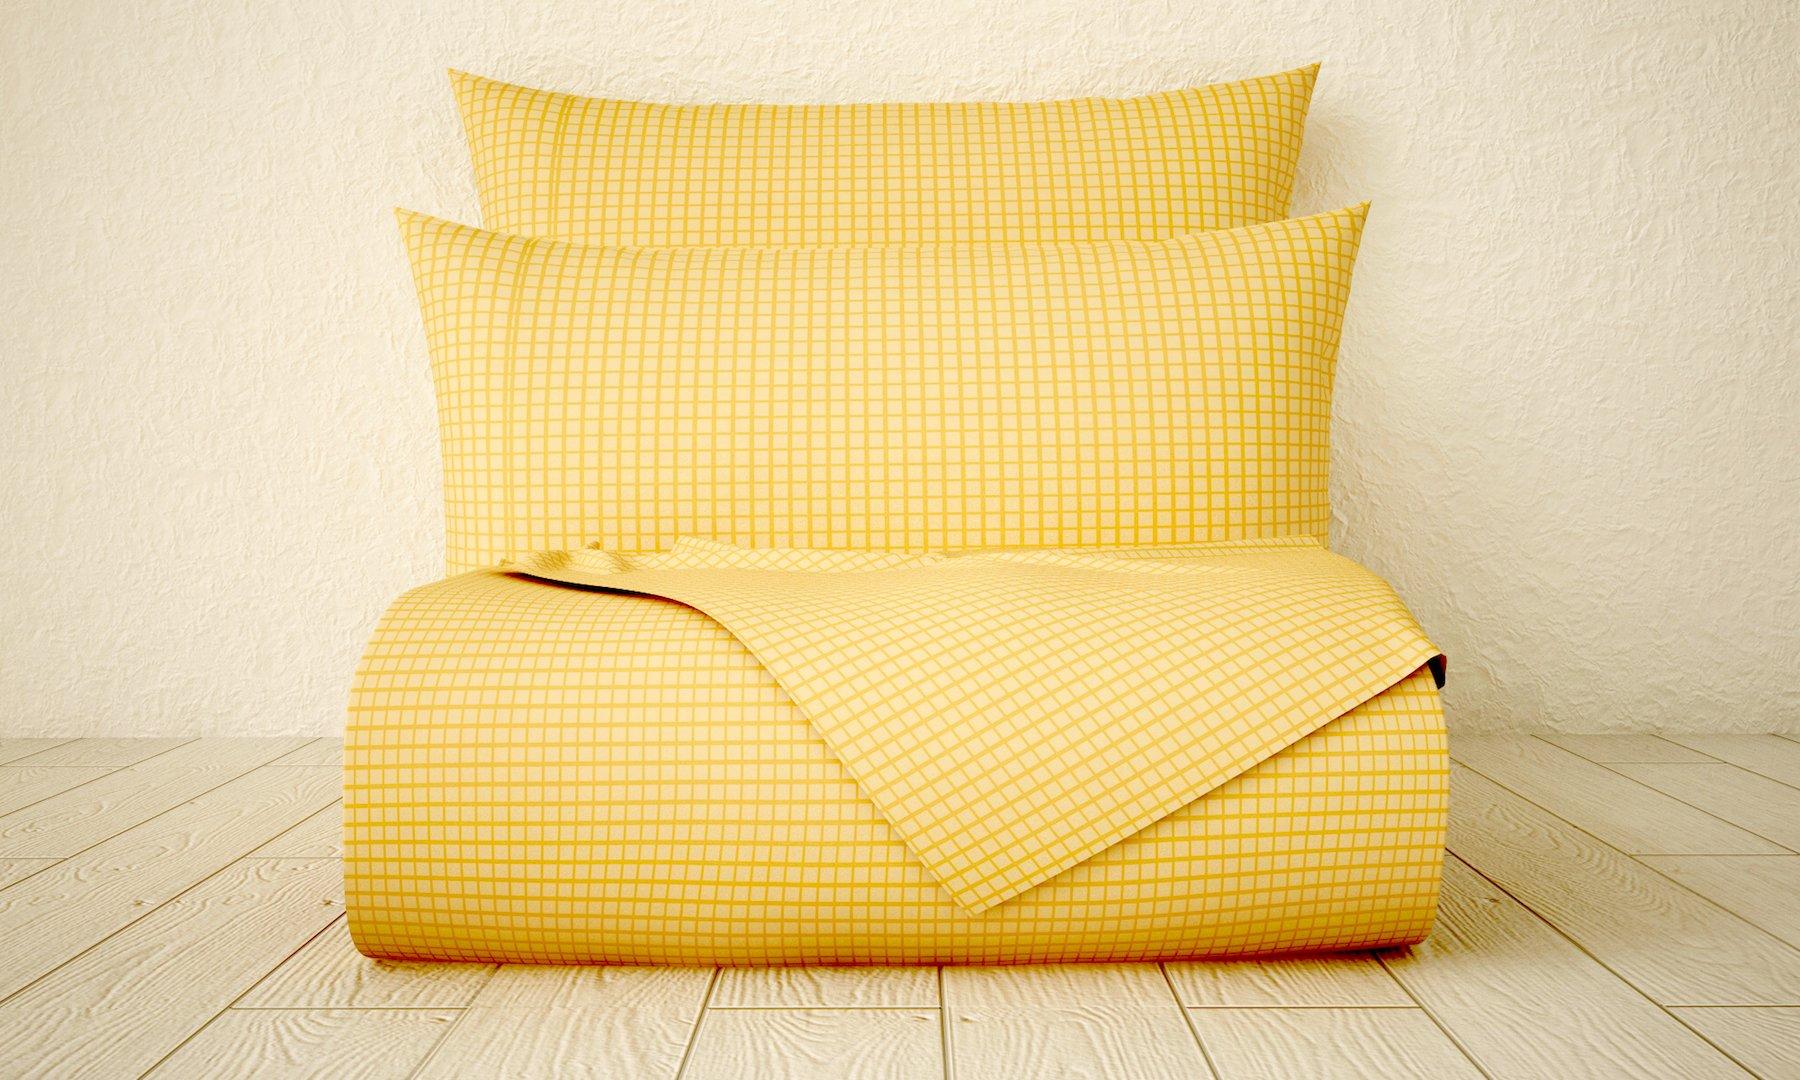 Xara Luxury 33254 4 Piece Window Pane 1800 Series Printed Cotton Essential Embossed Tone on Tone Bed Sheet Set, Queen, Beige